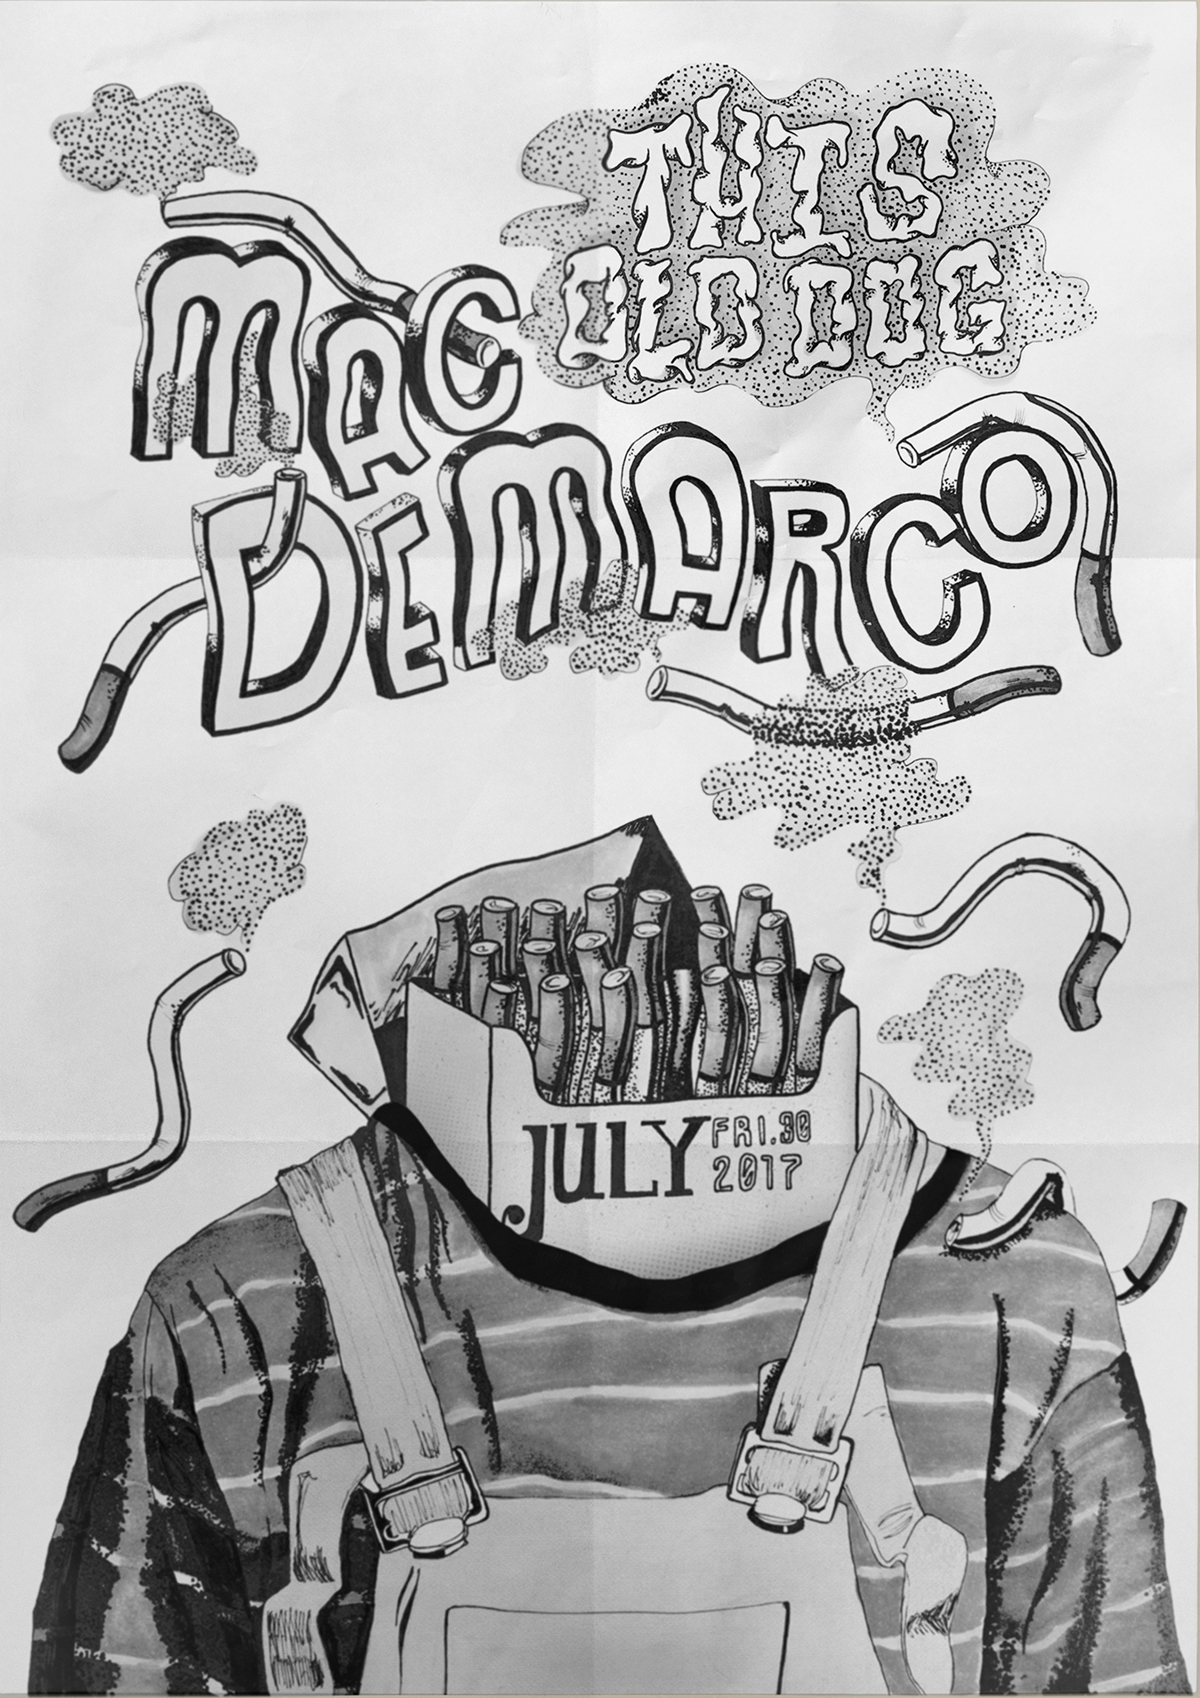 old dog gig poster on aiga member